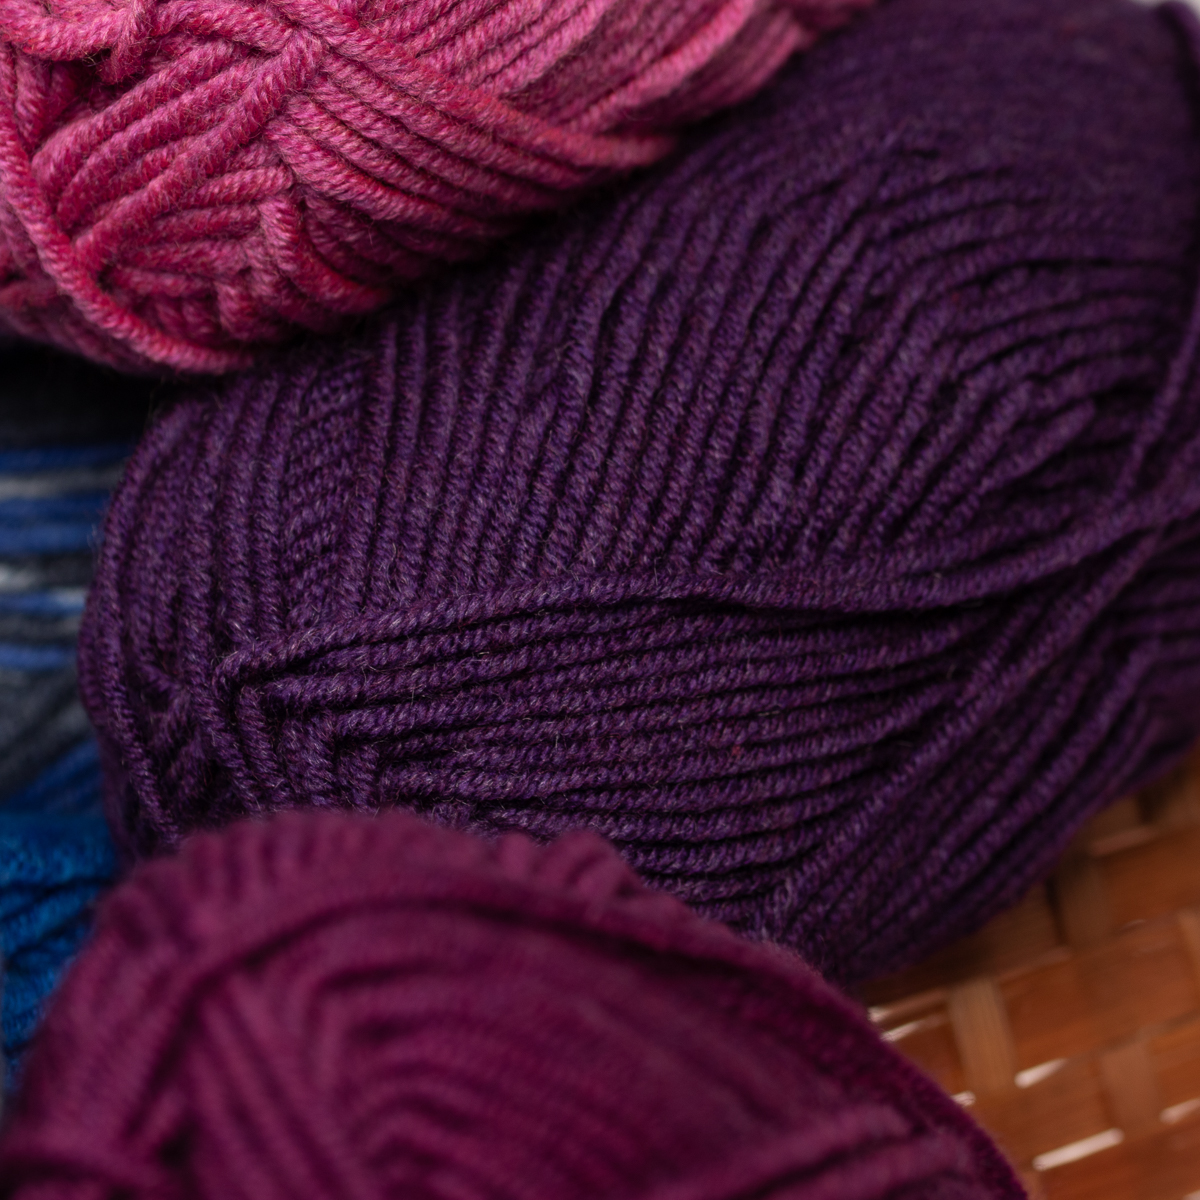 3pk-Lion-Brand-Woolspun-Acrylic-amp-Wool-Yarn-Bulky-5-Knit-Crocheting-Skeins-Soft thumbnail 78